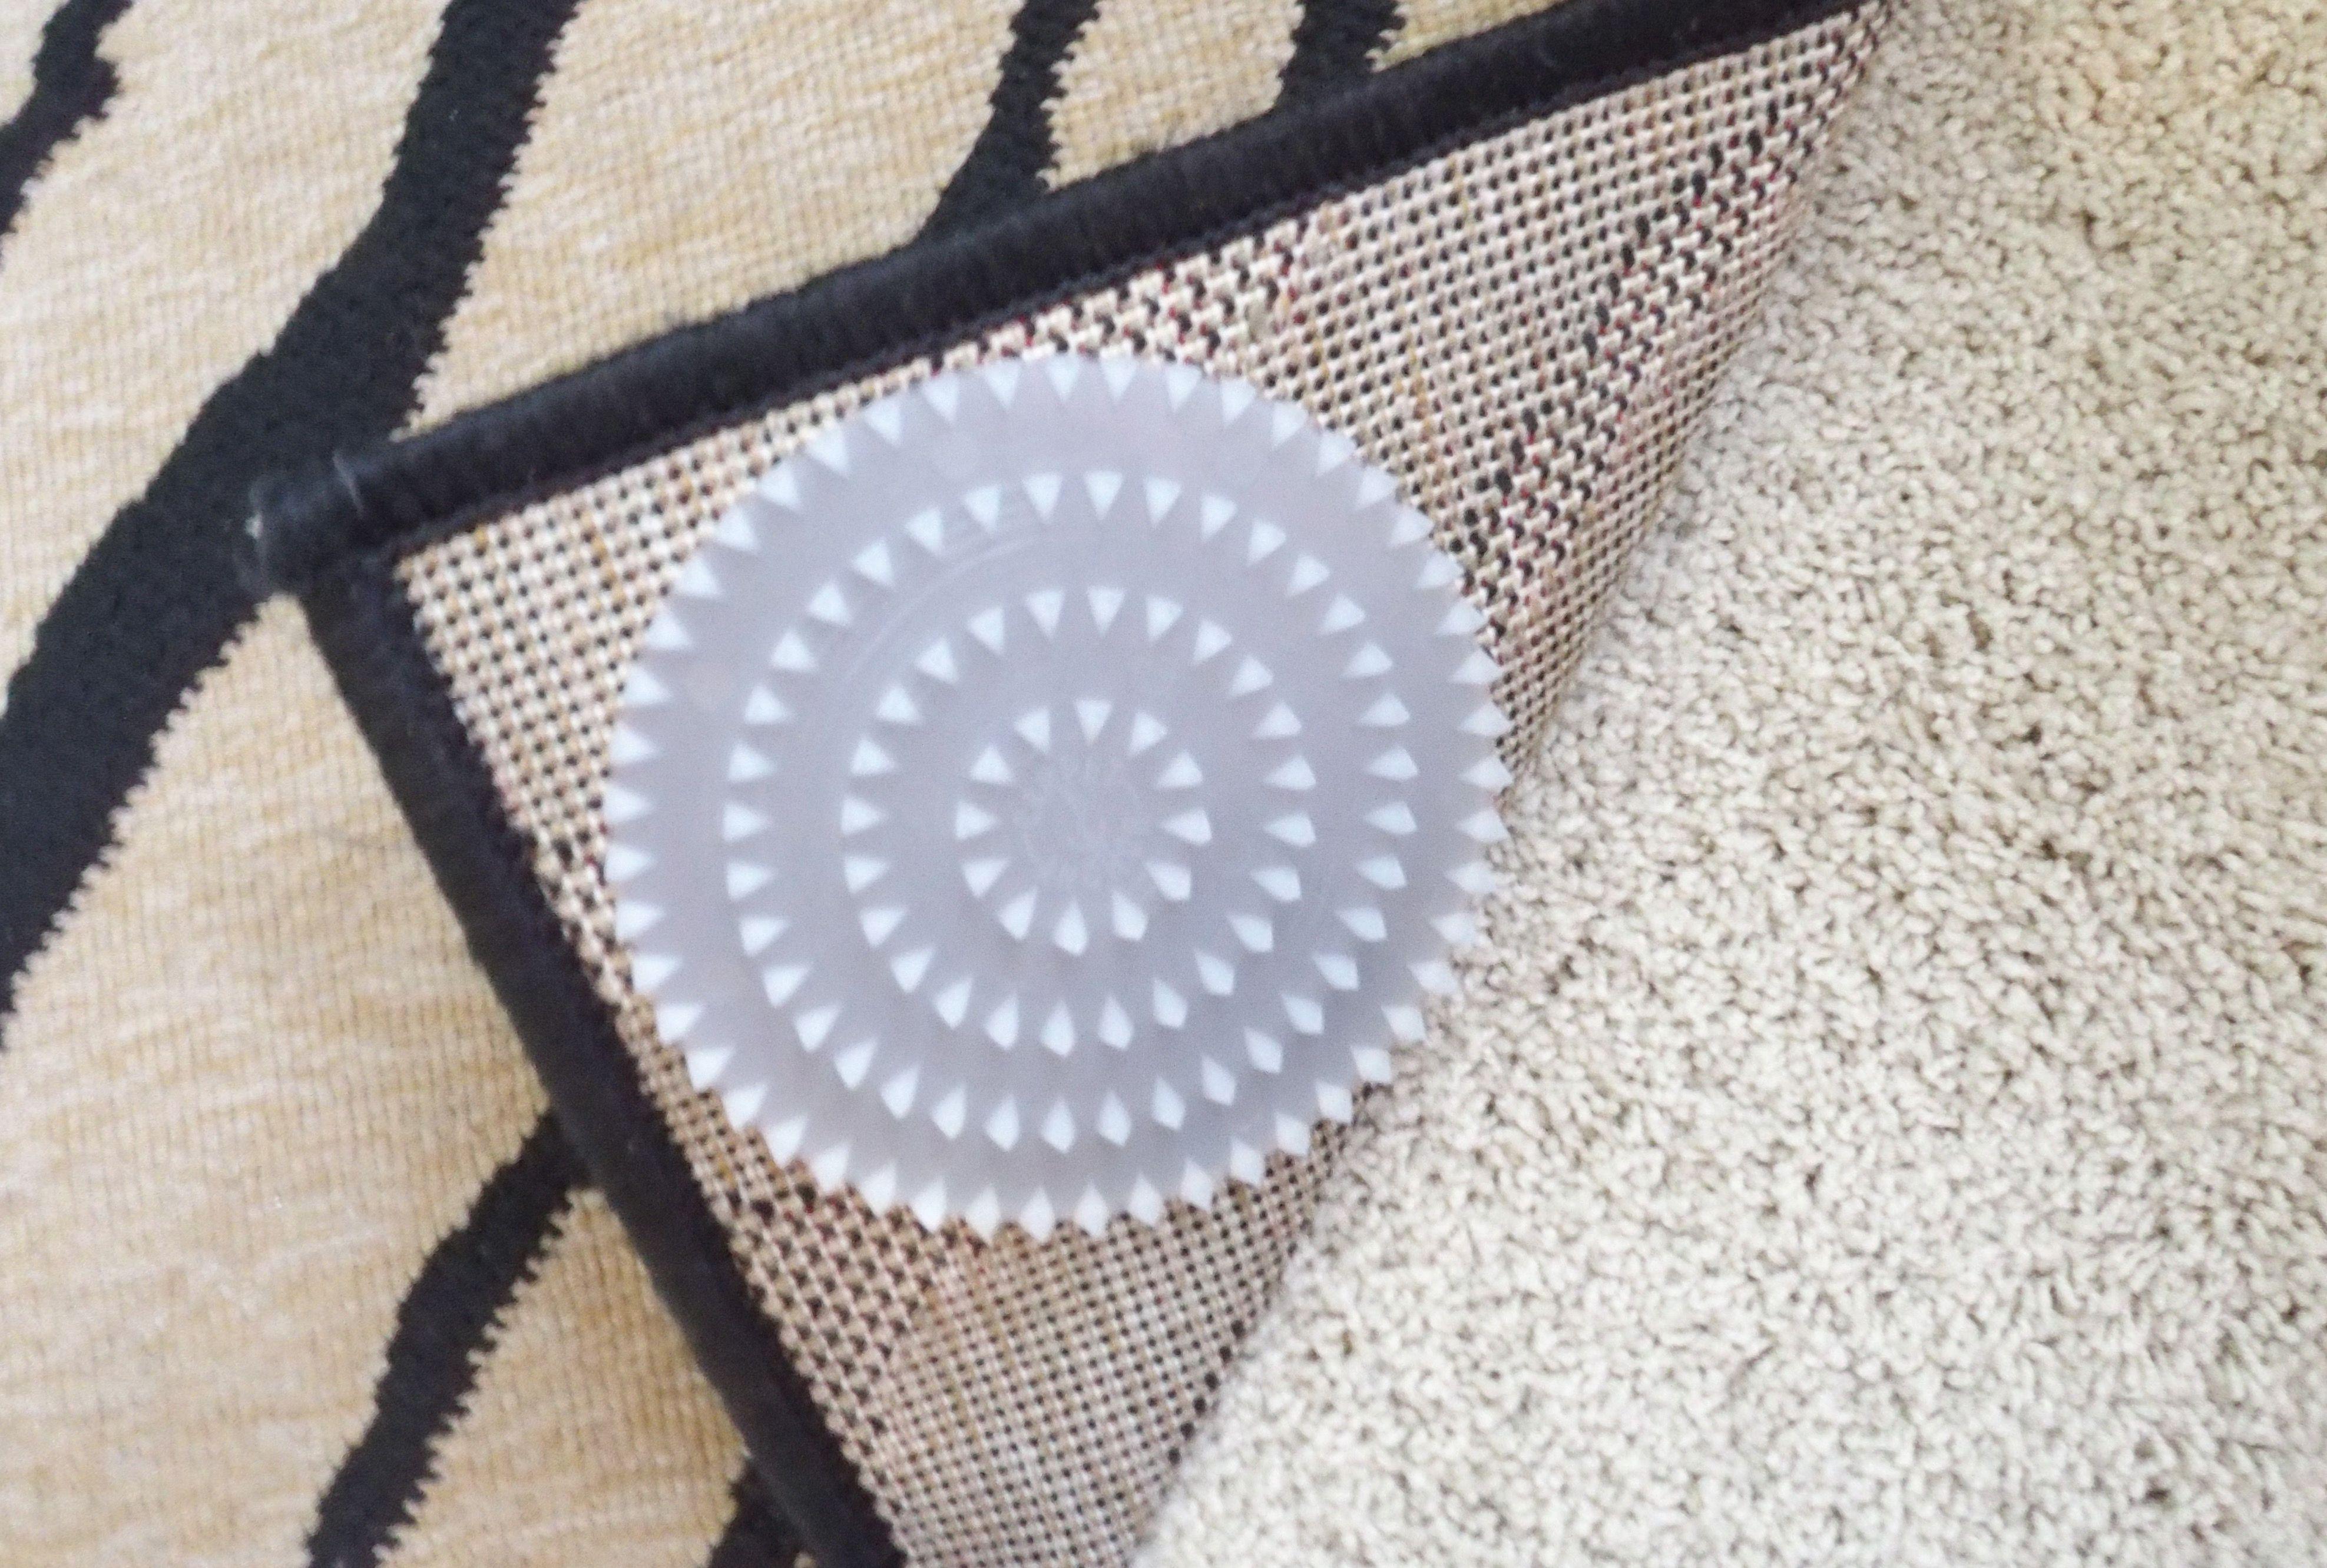 Carpet anchor rug on carpet antislip pads want need